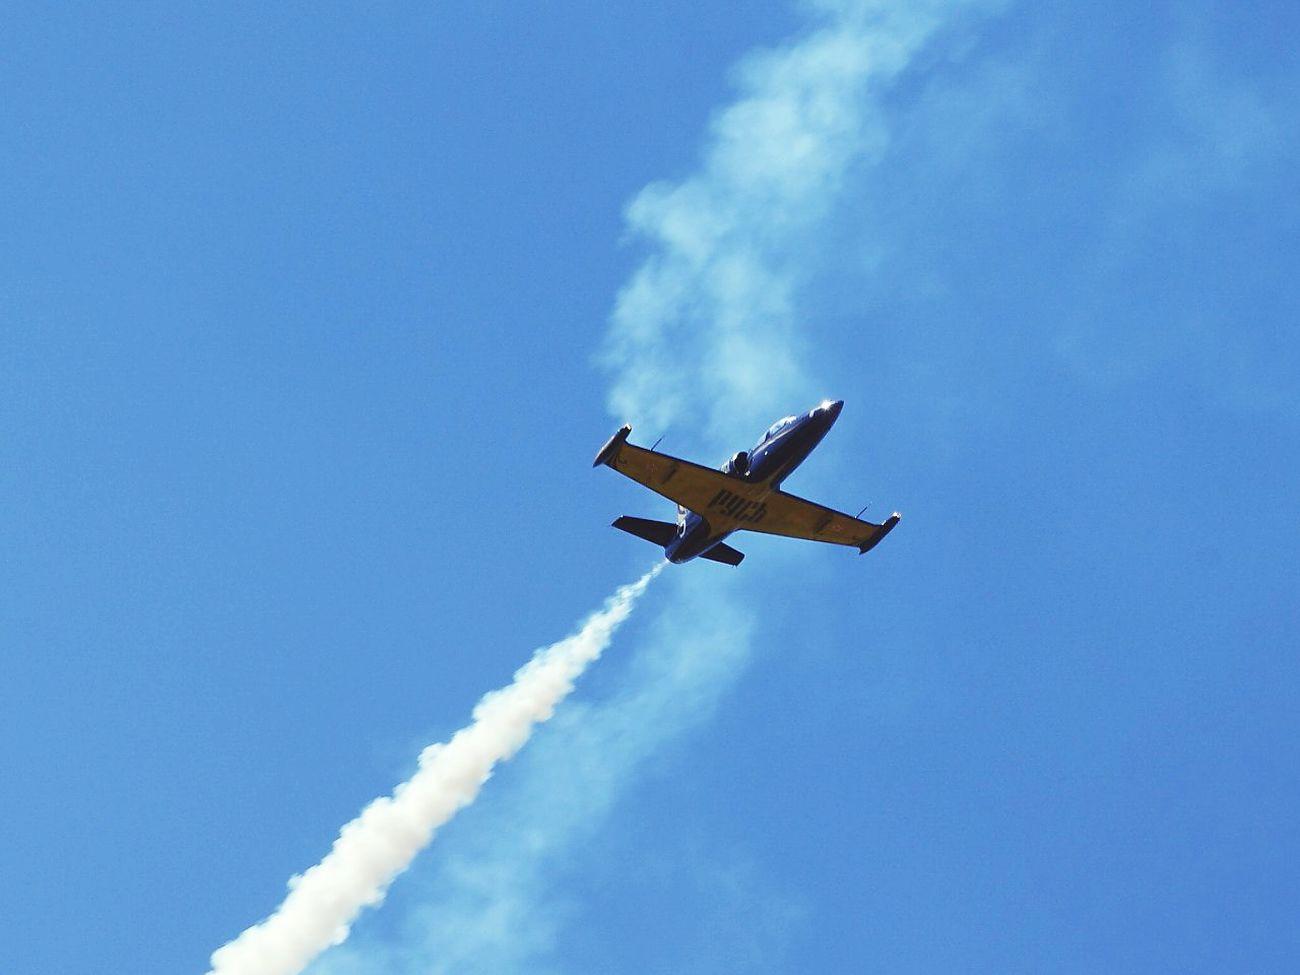 Air Самолёты авиошоу Perm' Ural Russia Sky небо Россия Hello World